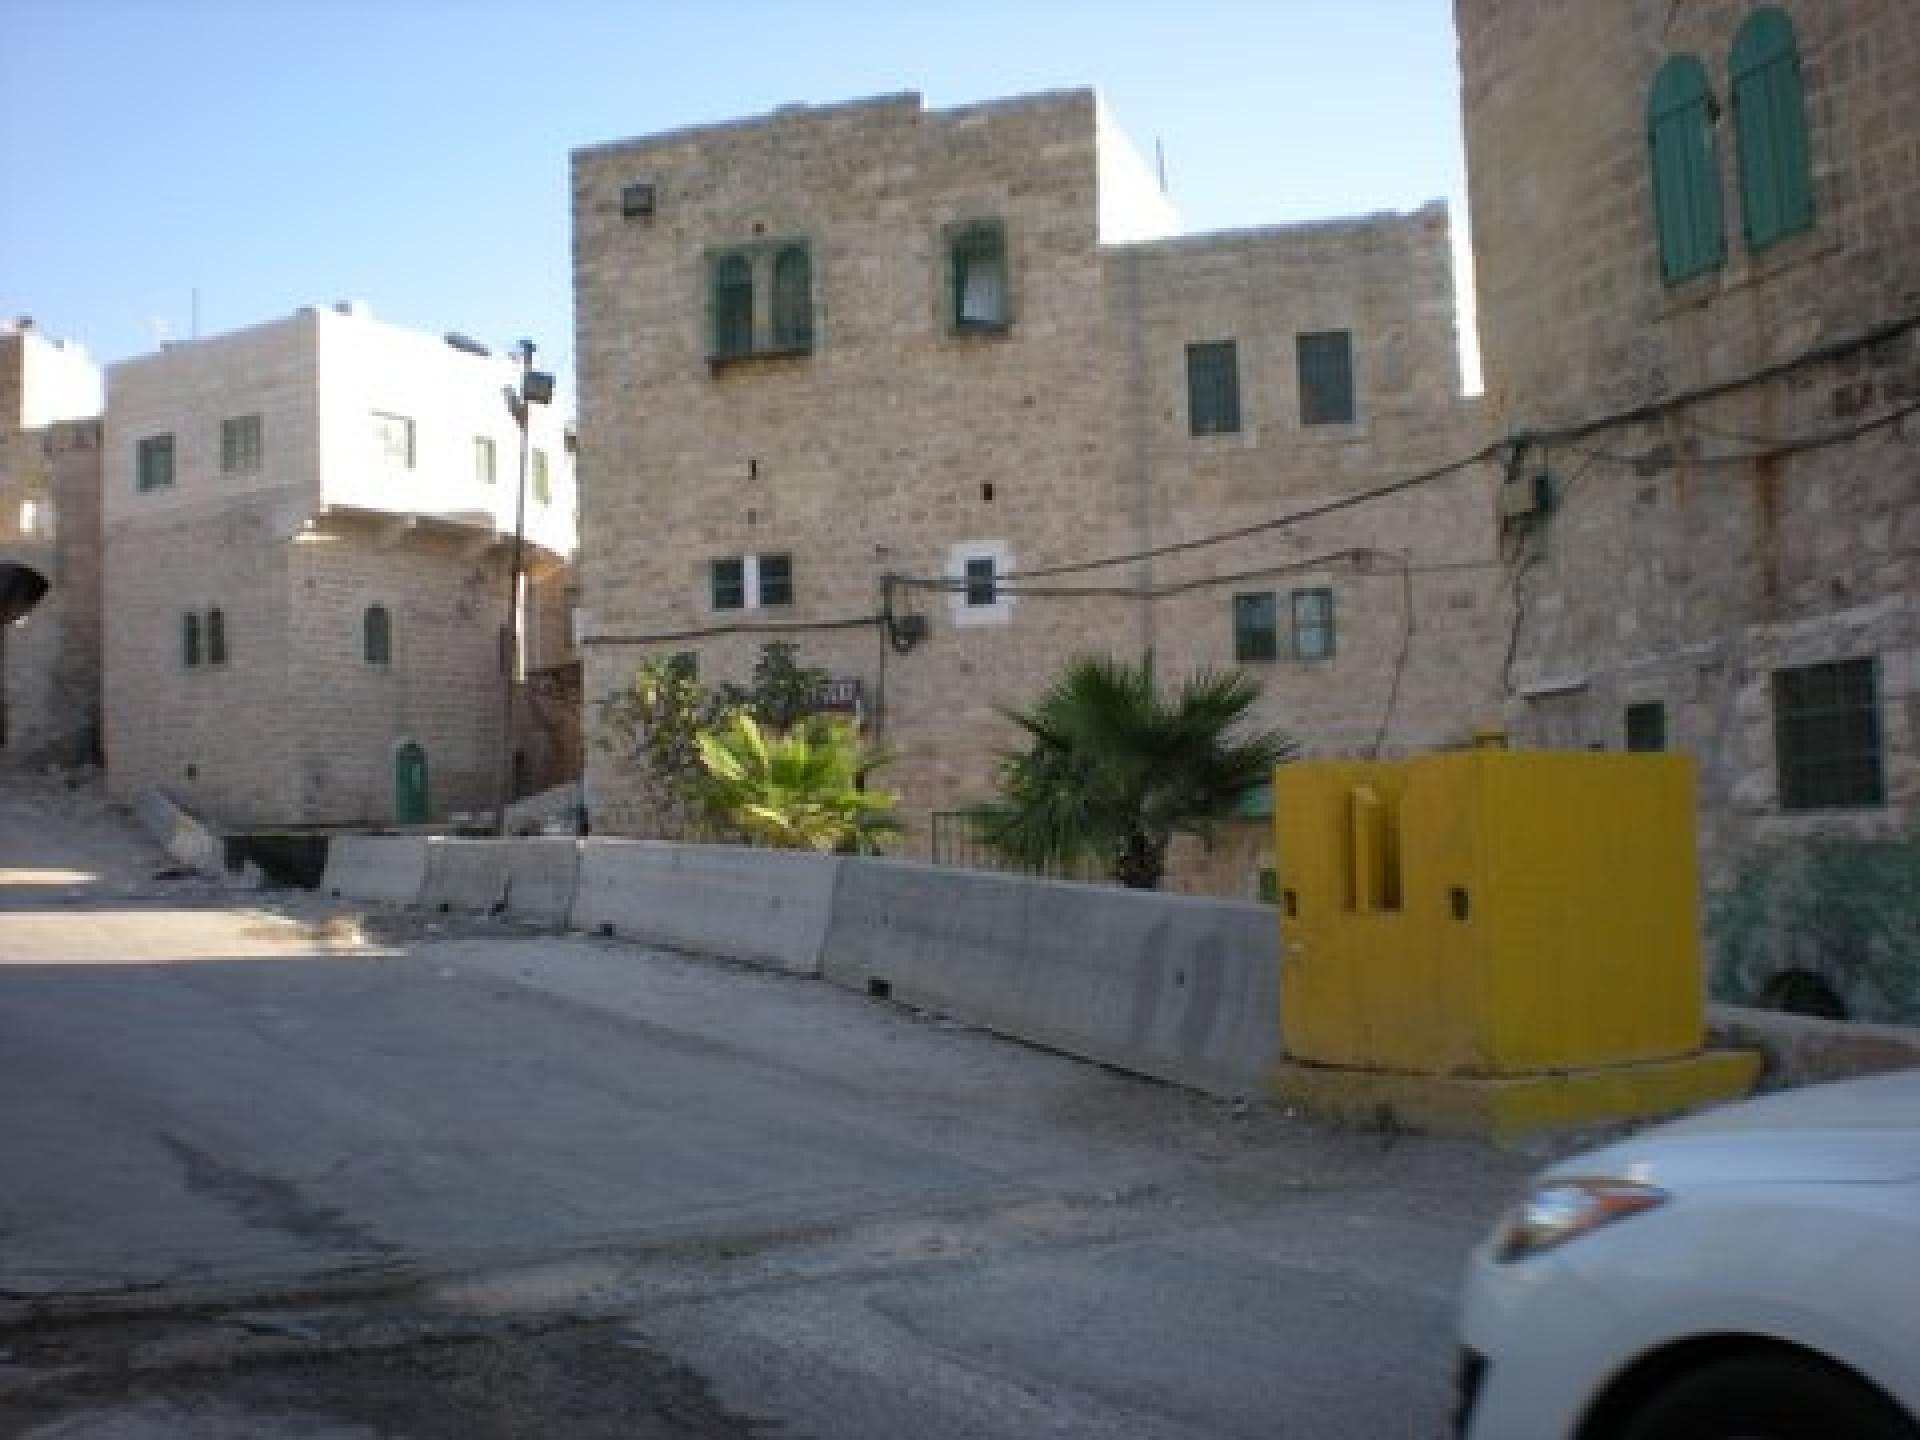 Hebron 14.11.10